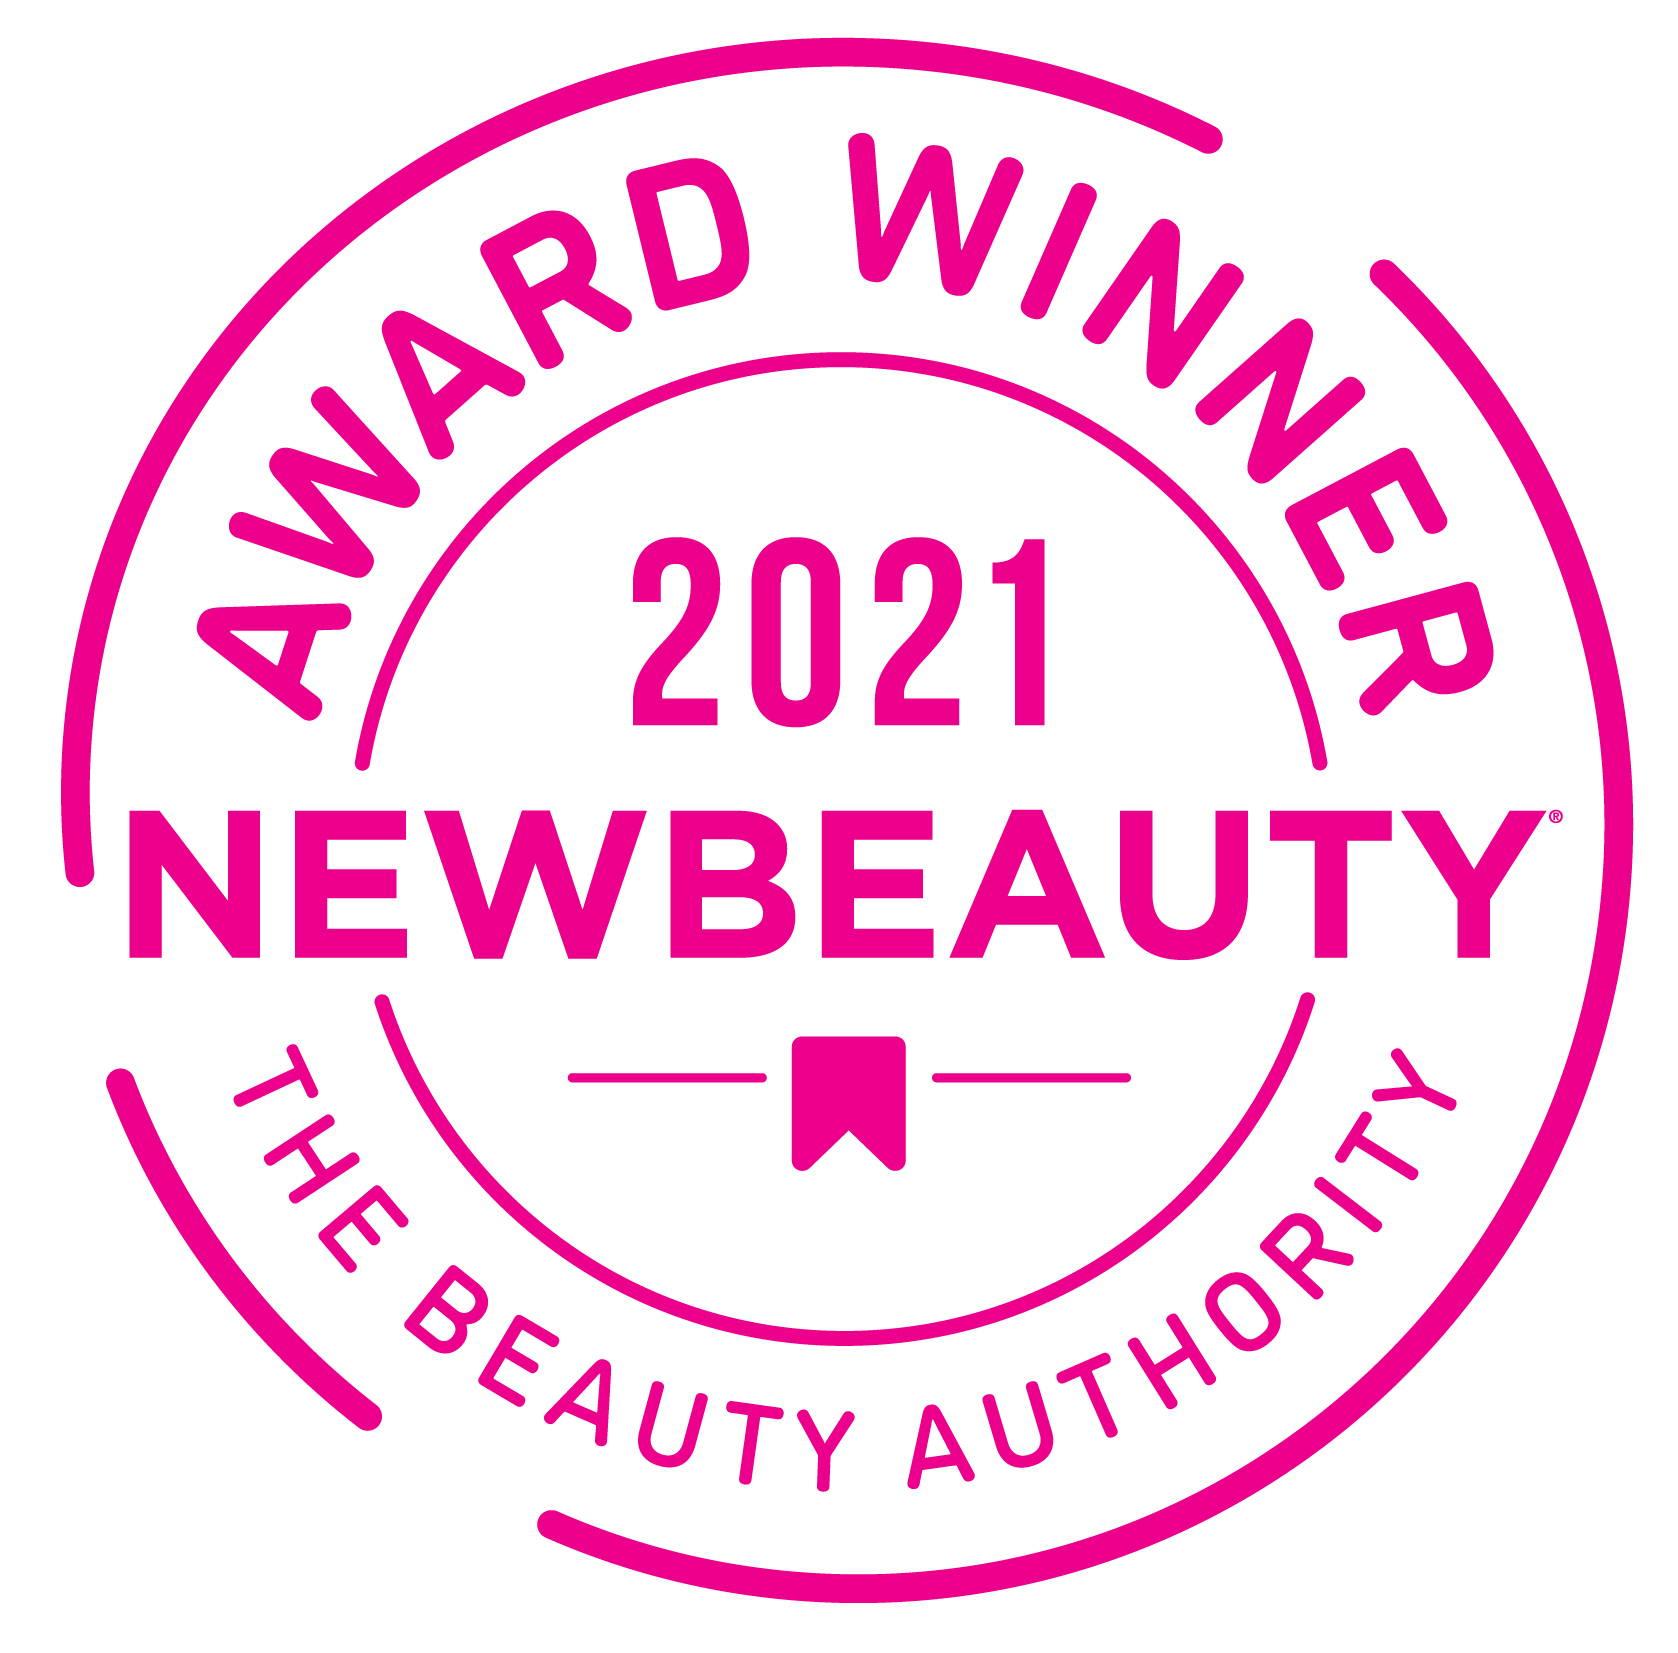 Award Winning Derma E Products NewBeauty Award Winner 2021